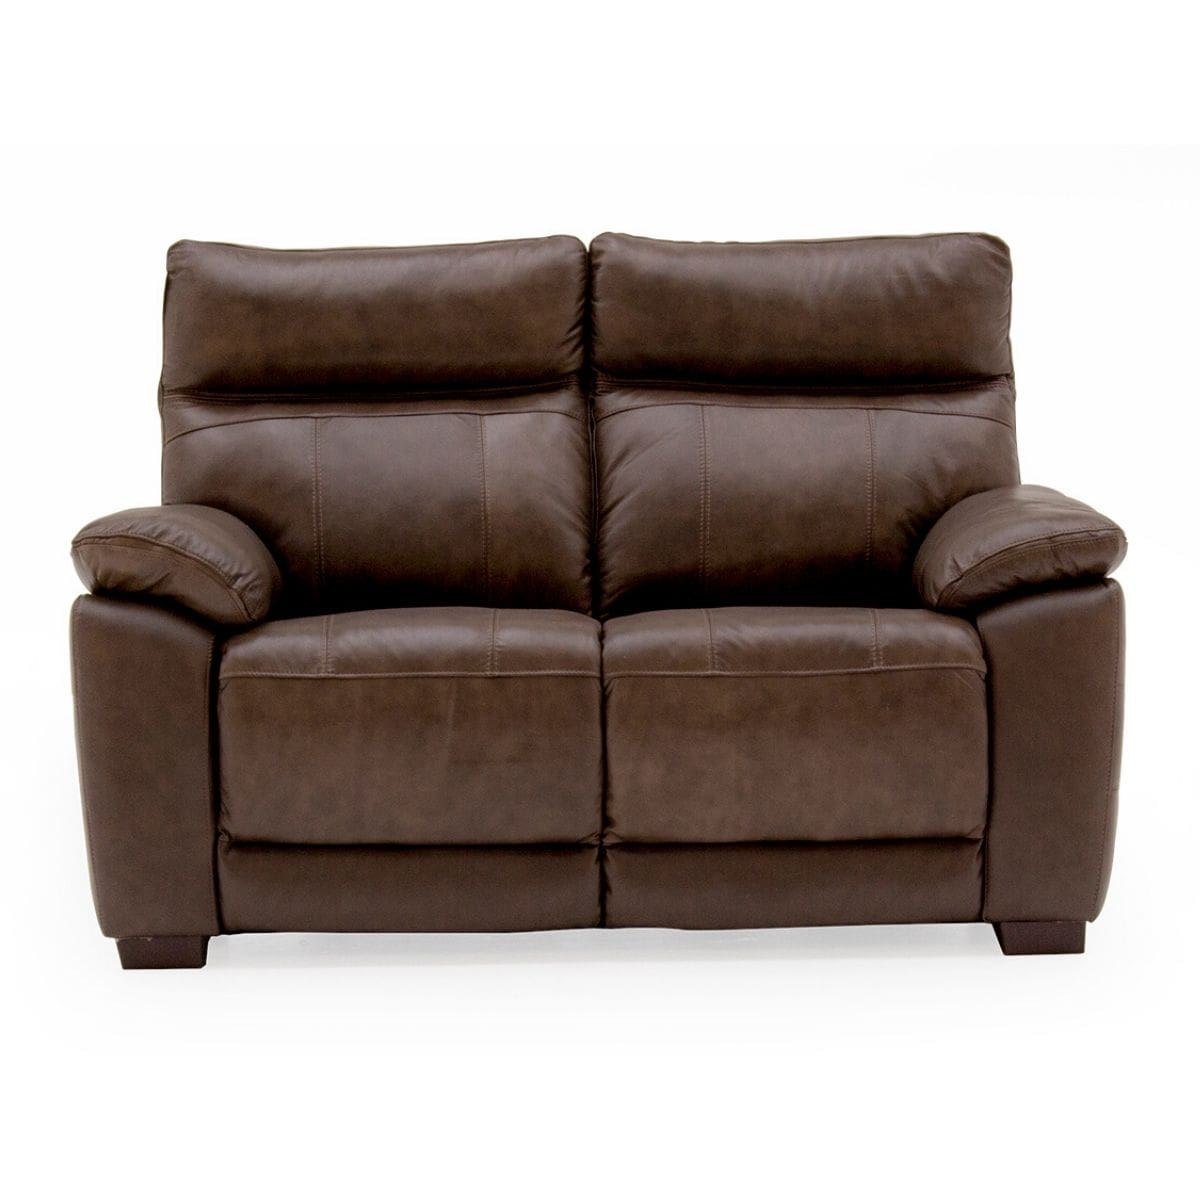 Pomona Leather 2 Seater Sofa